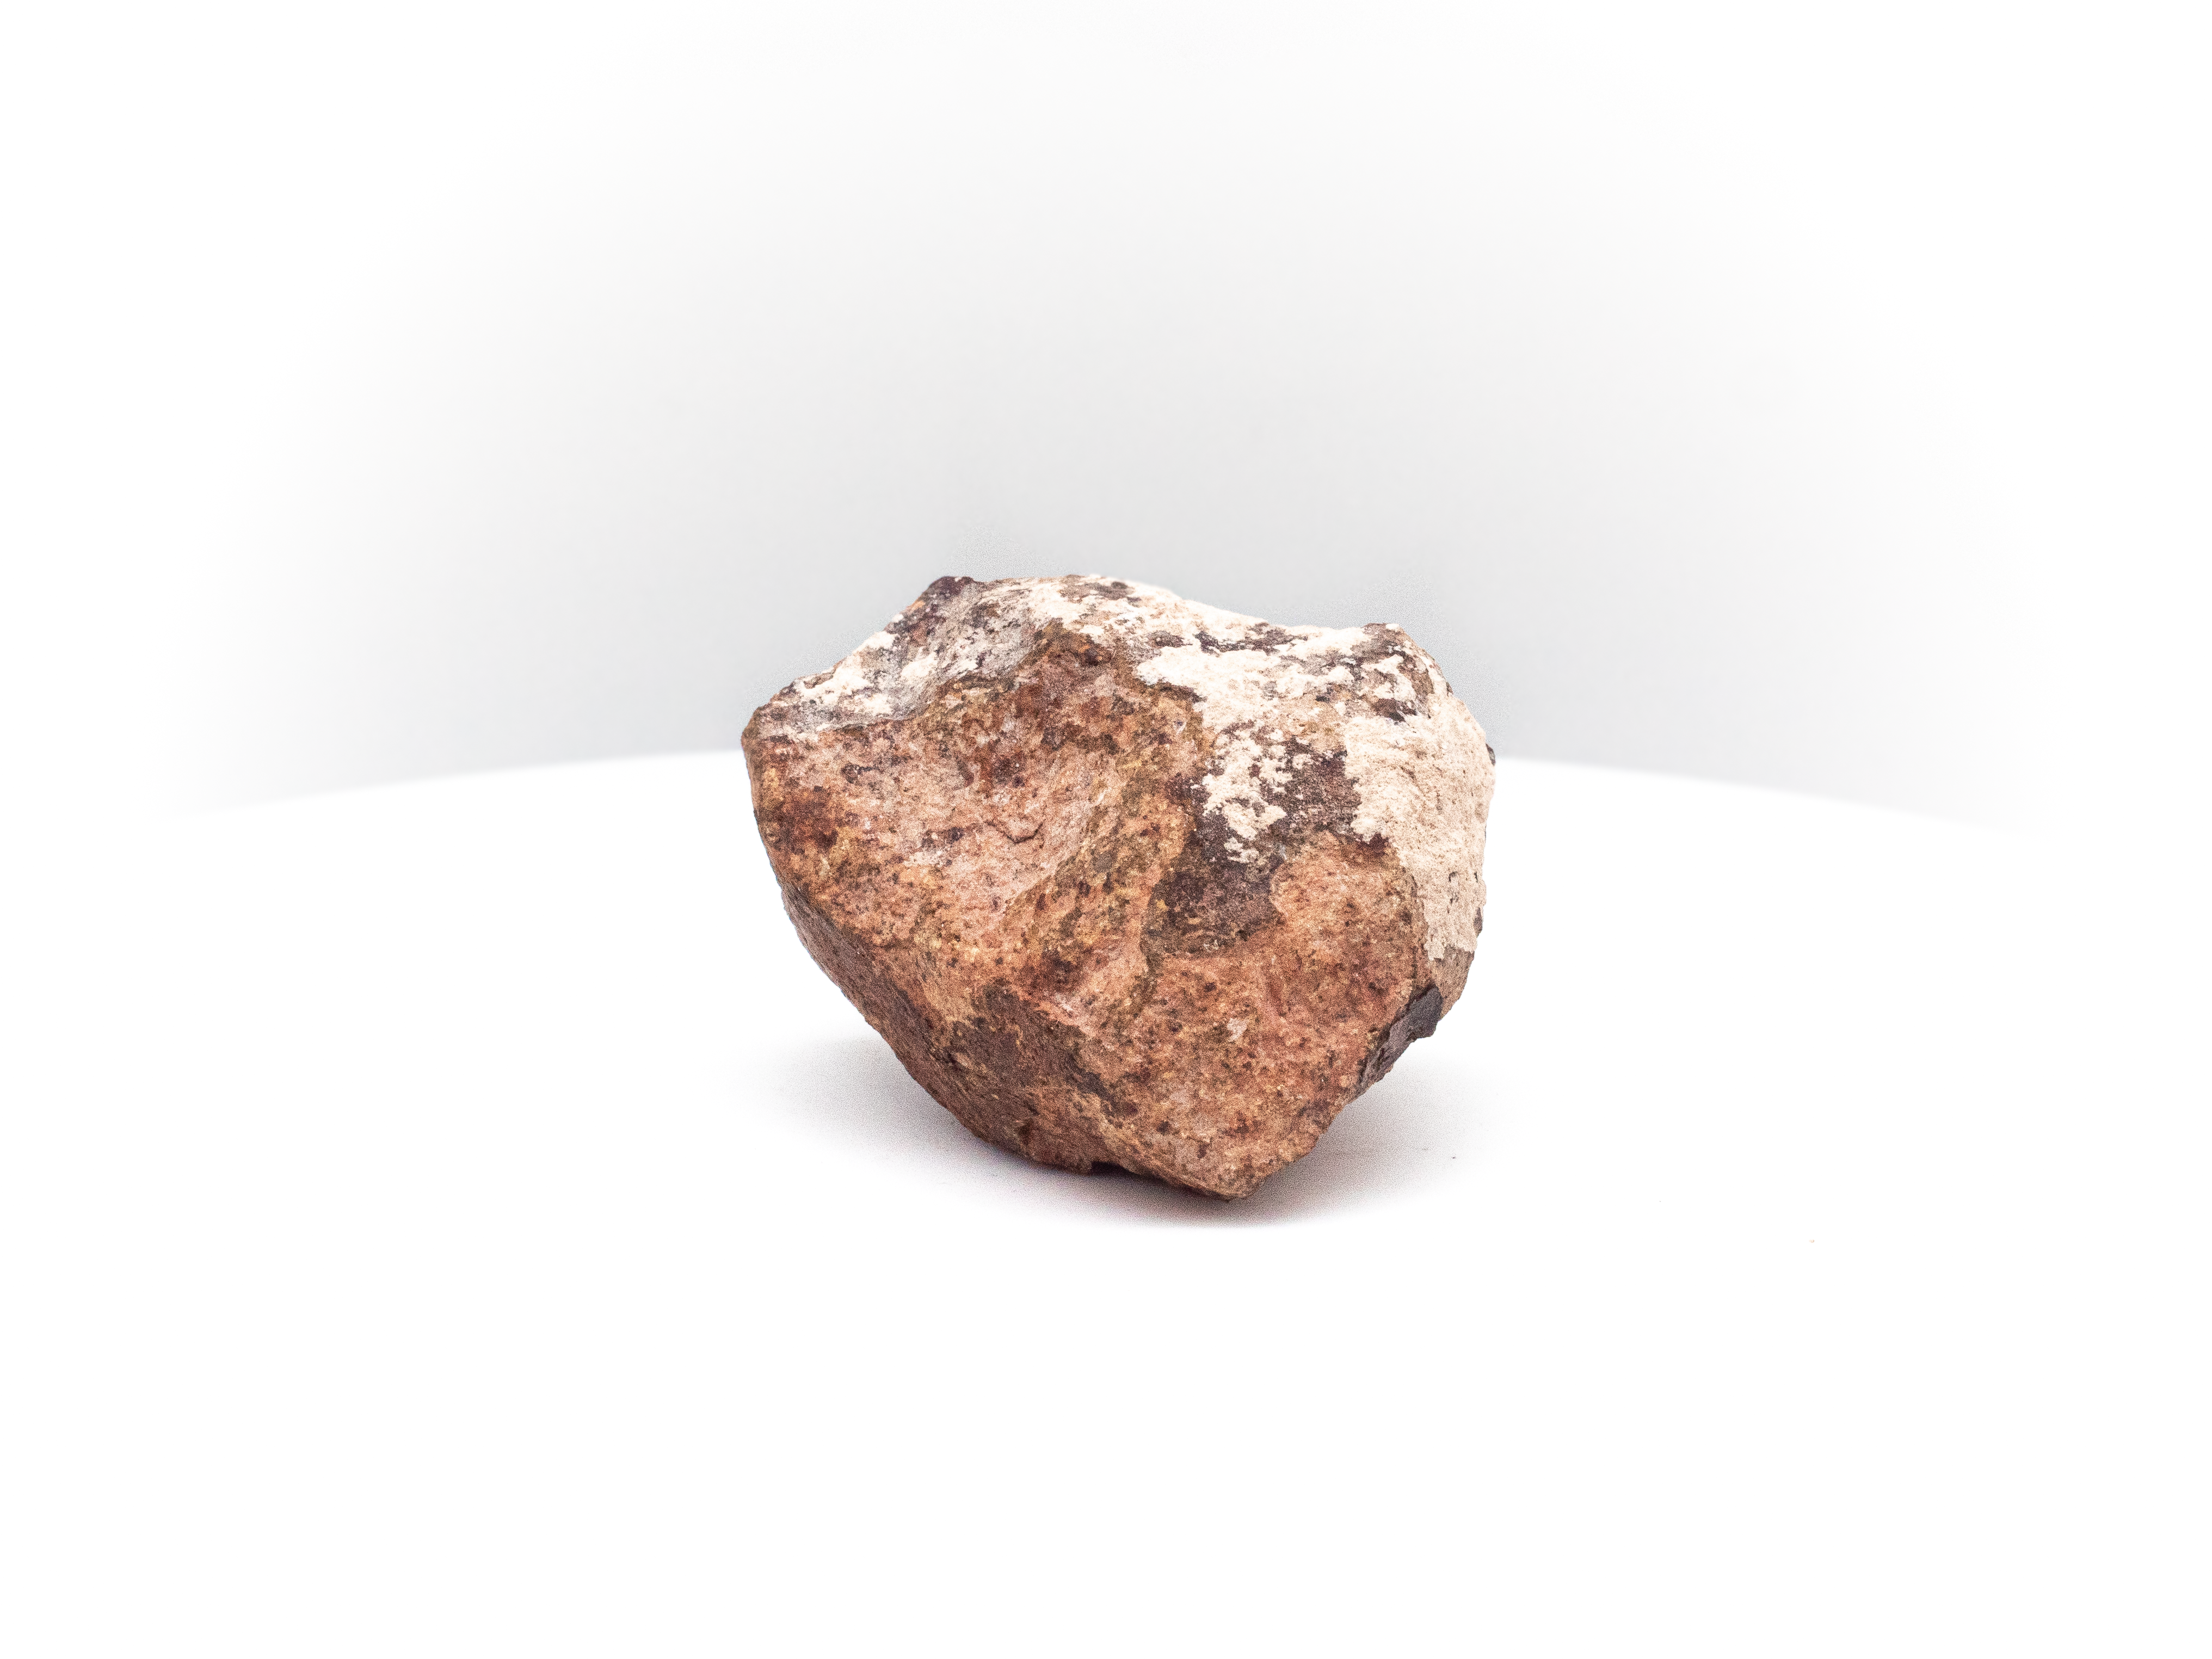 gold basin stone meteorite